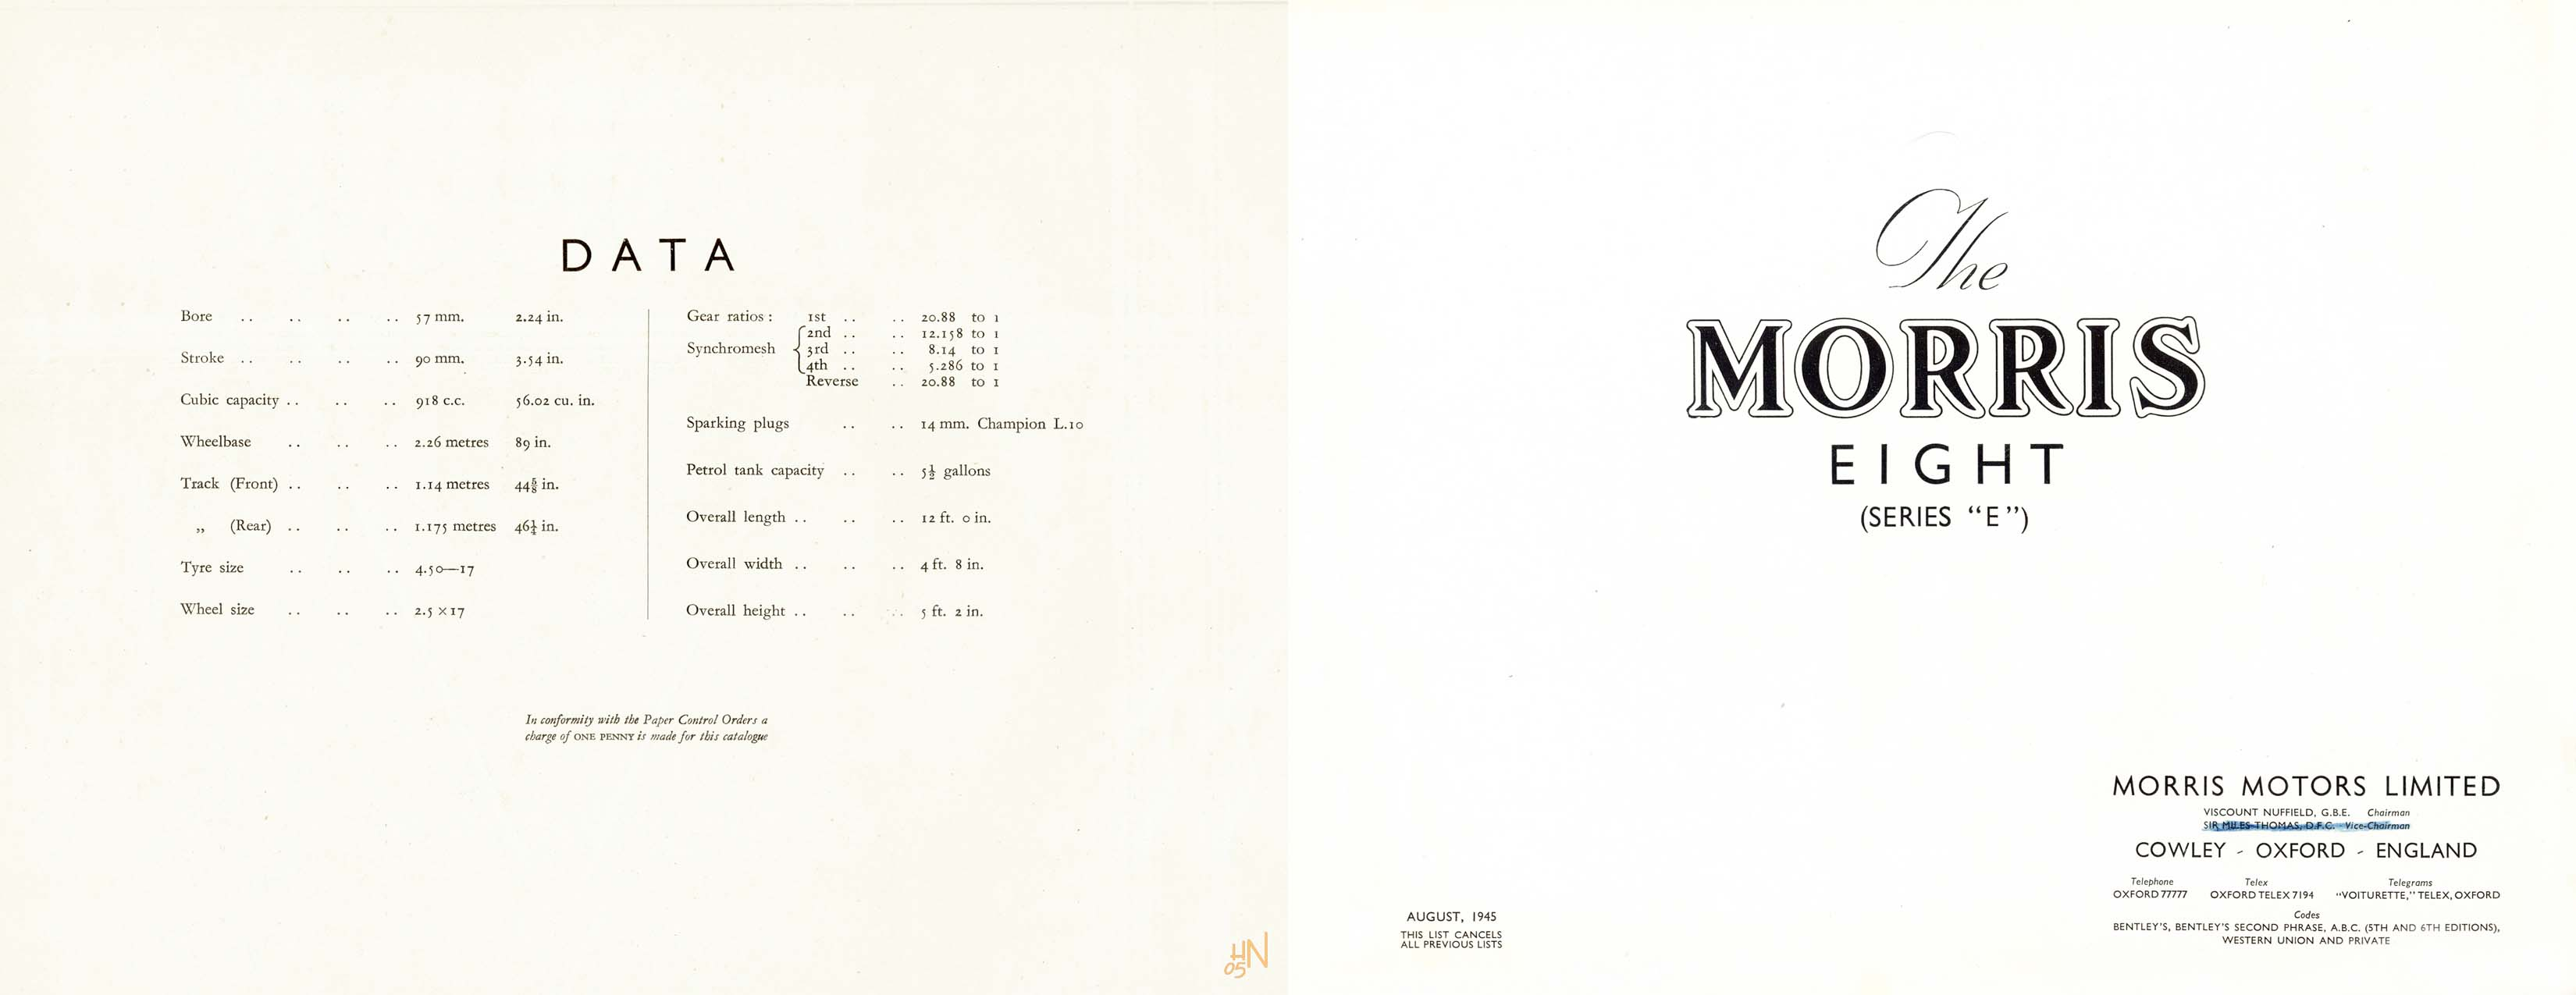 1945 Morris Eight series E brochure